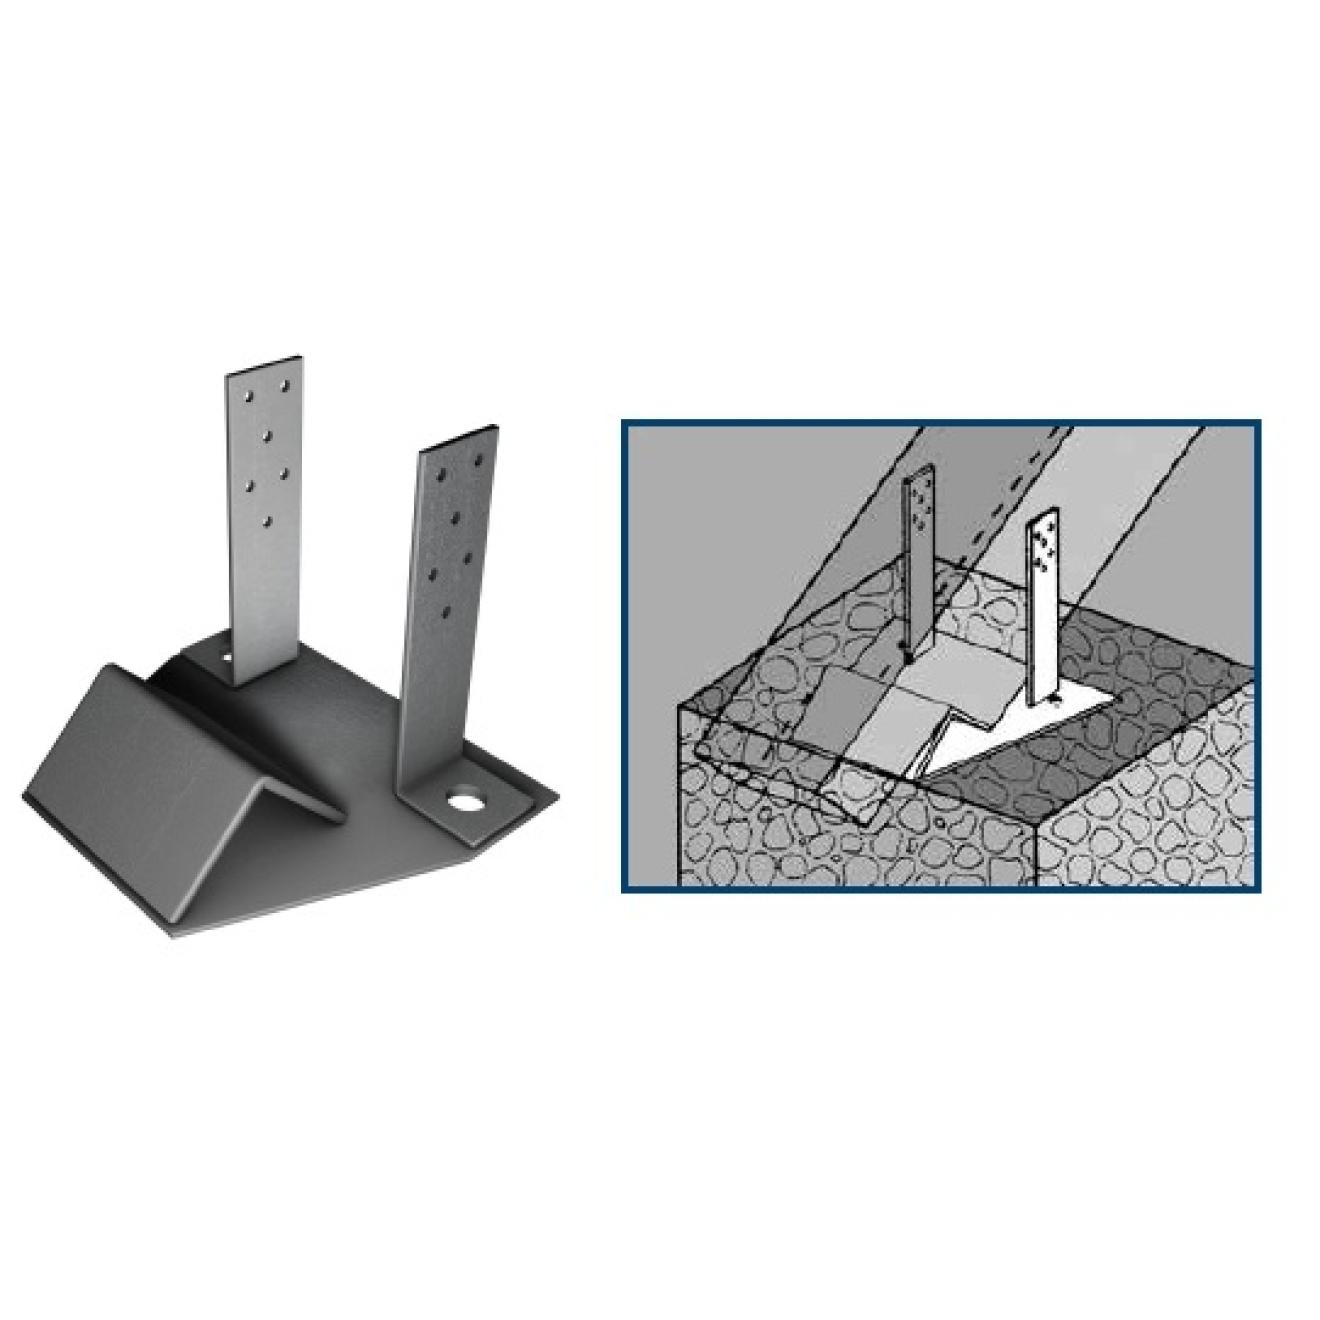 sparrenf e feuerverz f beton l nge 170mm breite 90mm gabelbreite 80mm seitenplatten. Black Bedroom Furniture Sets. Home Design Ideas